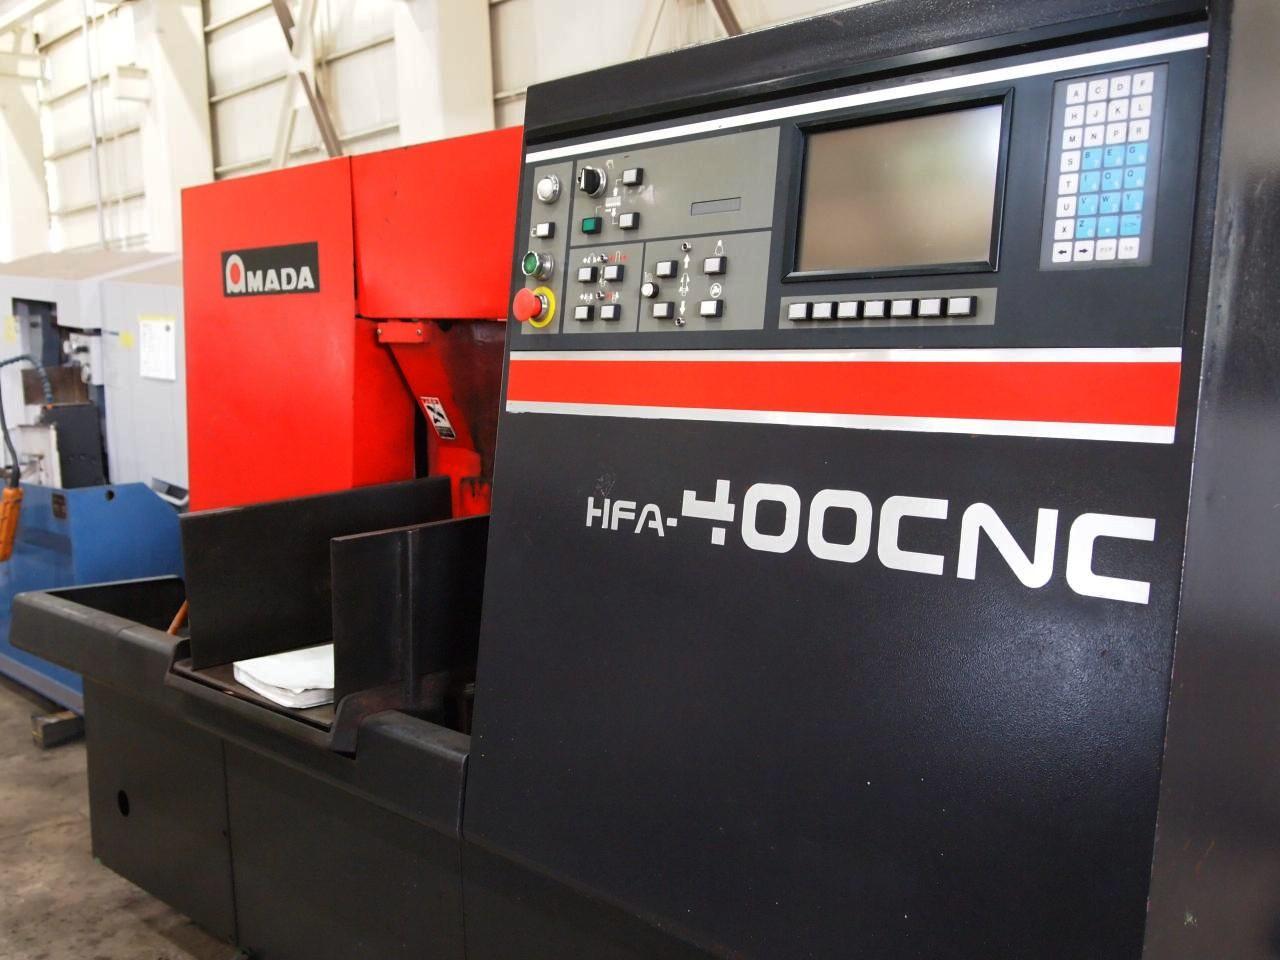 HFA-400CNC操作盤・型式表示